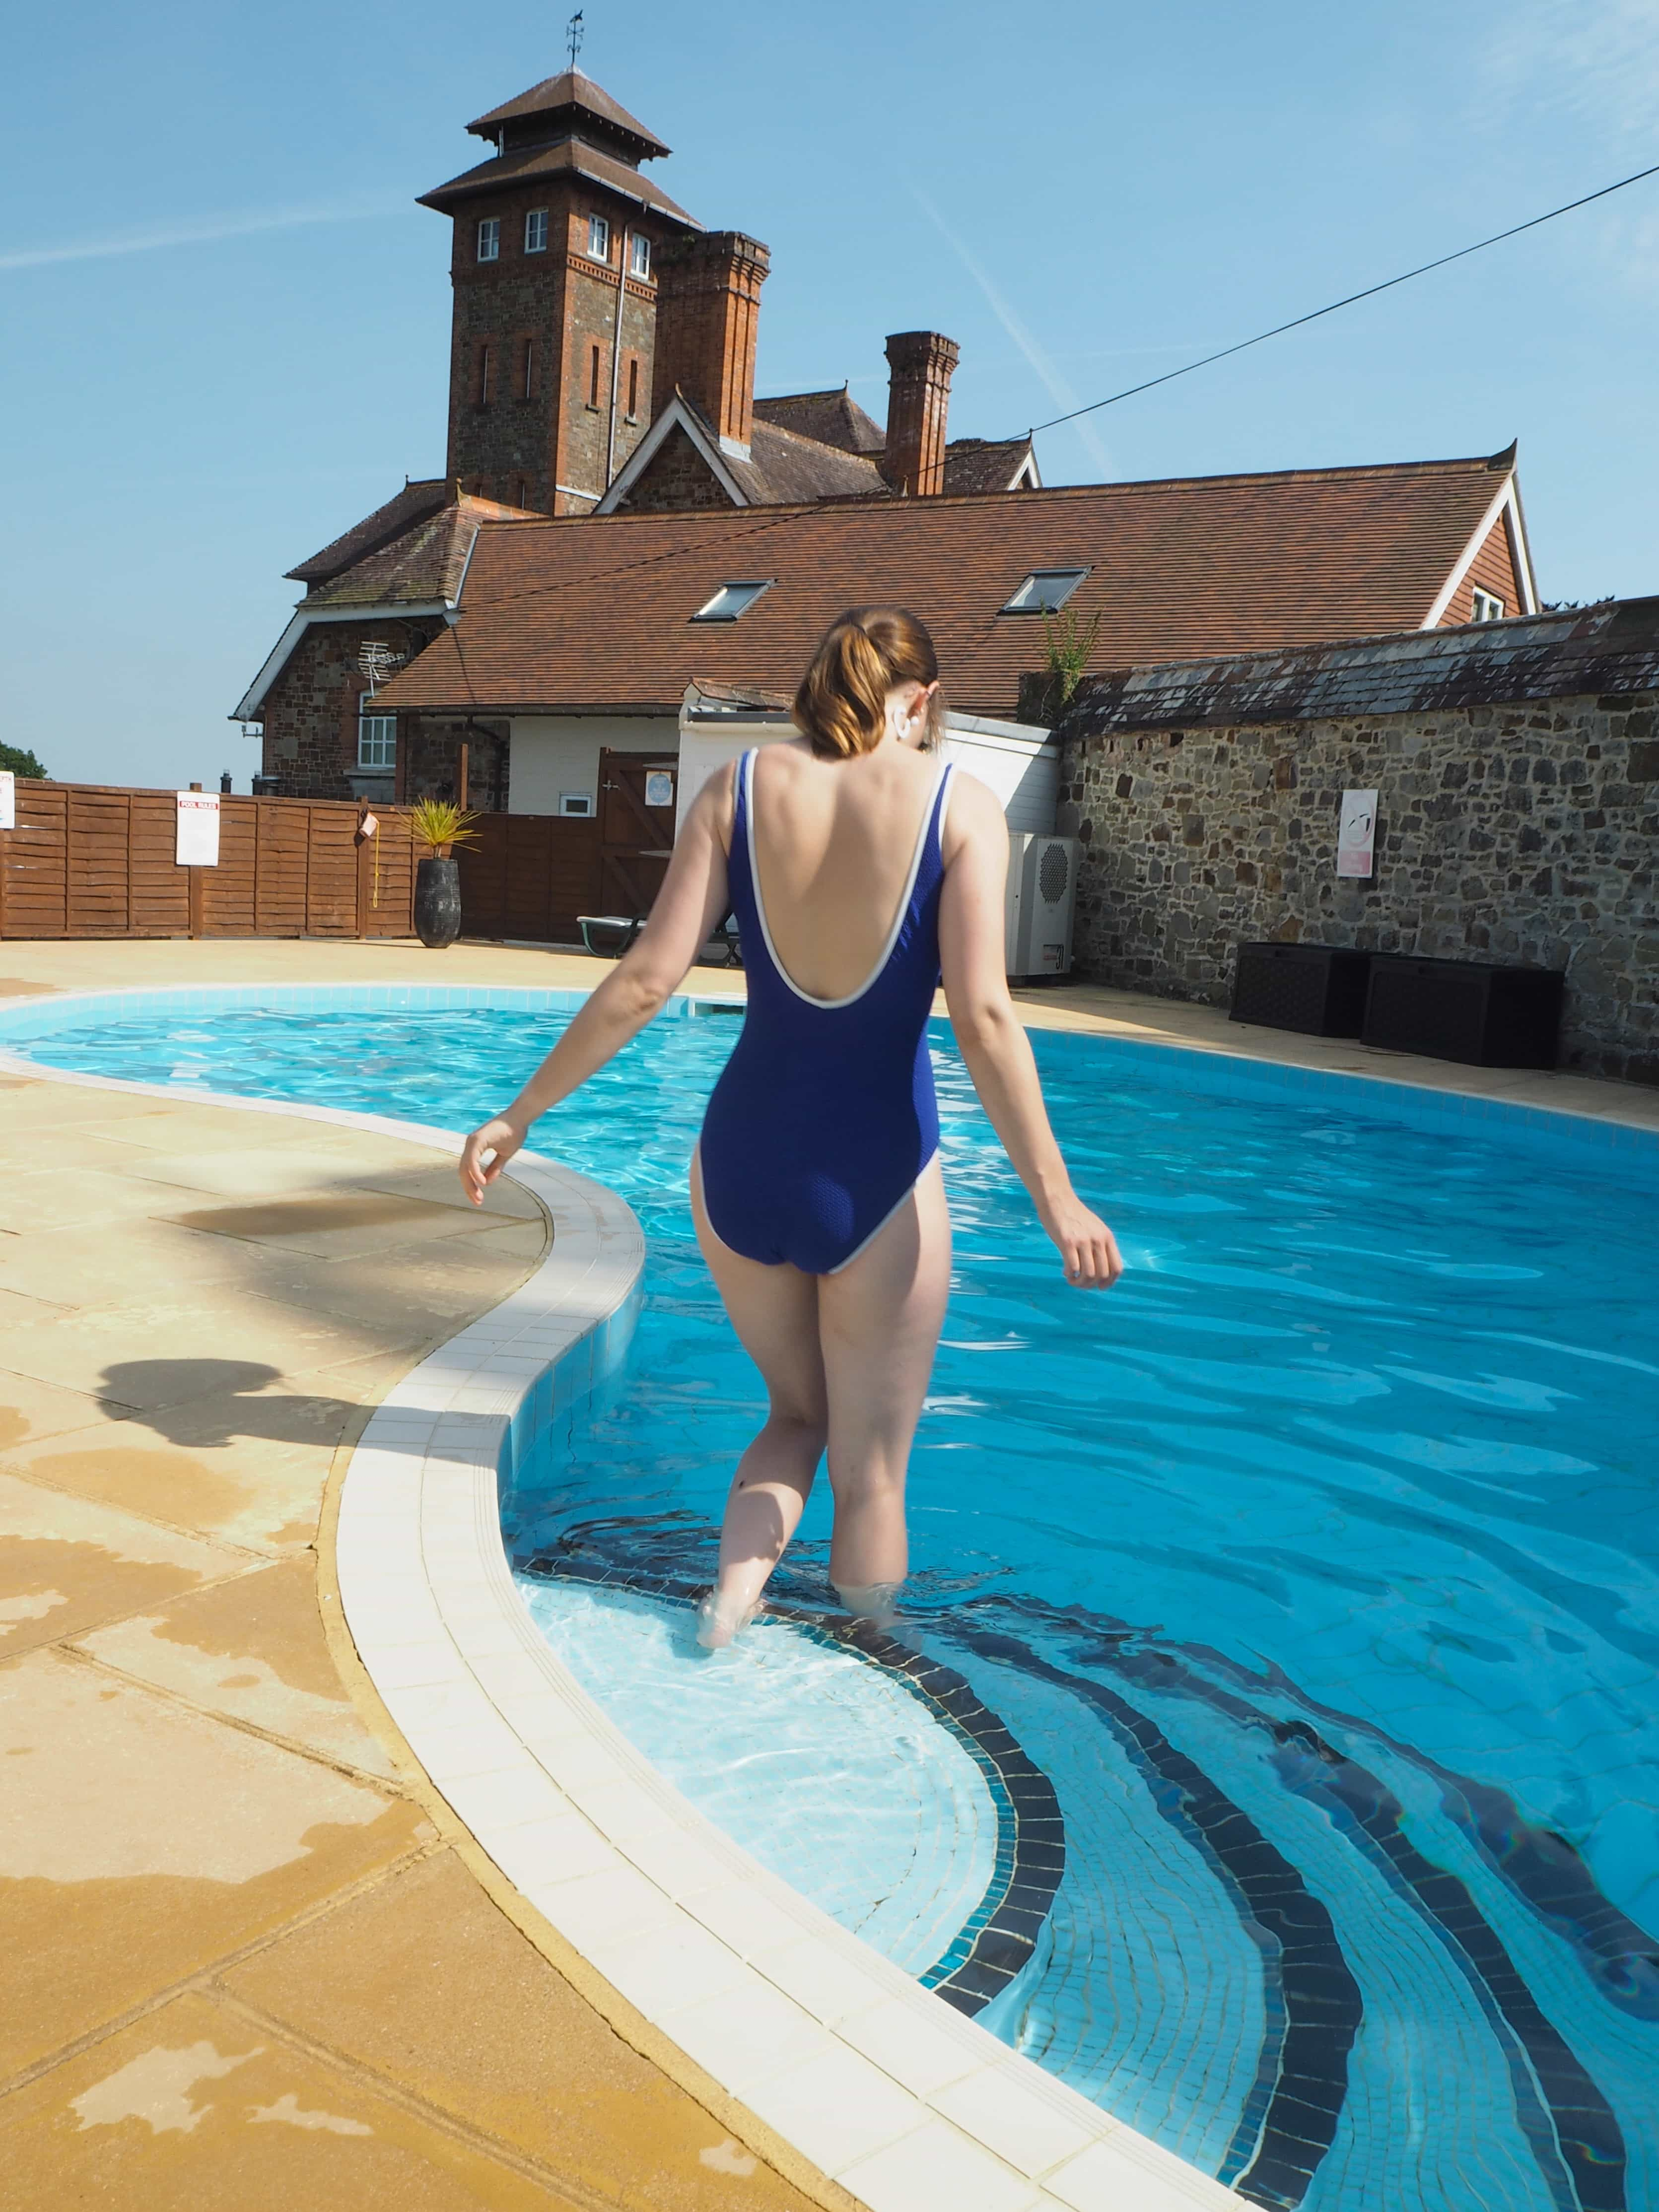 How To Feel Body Confident In Swimwear